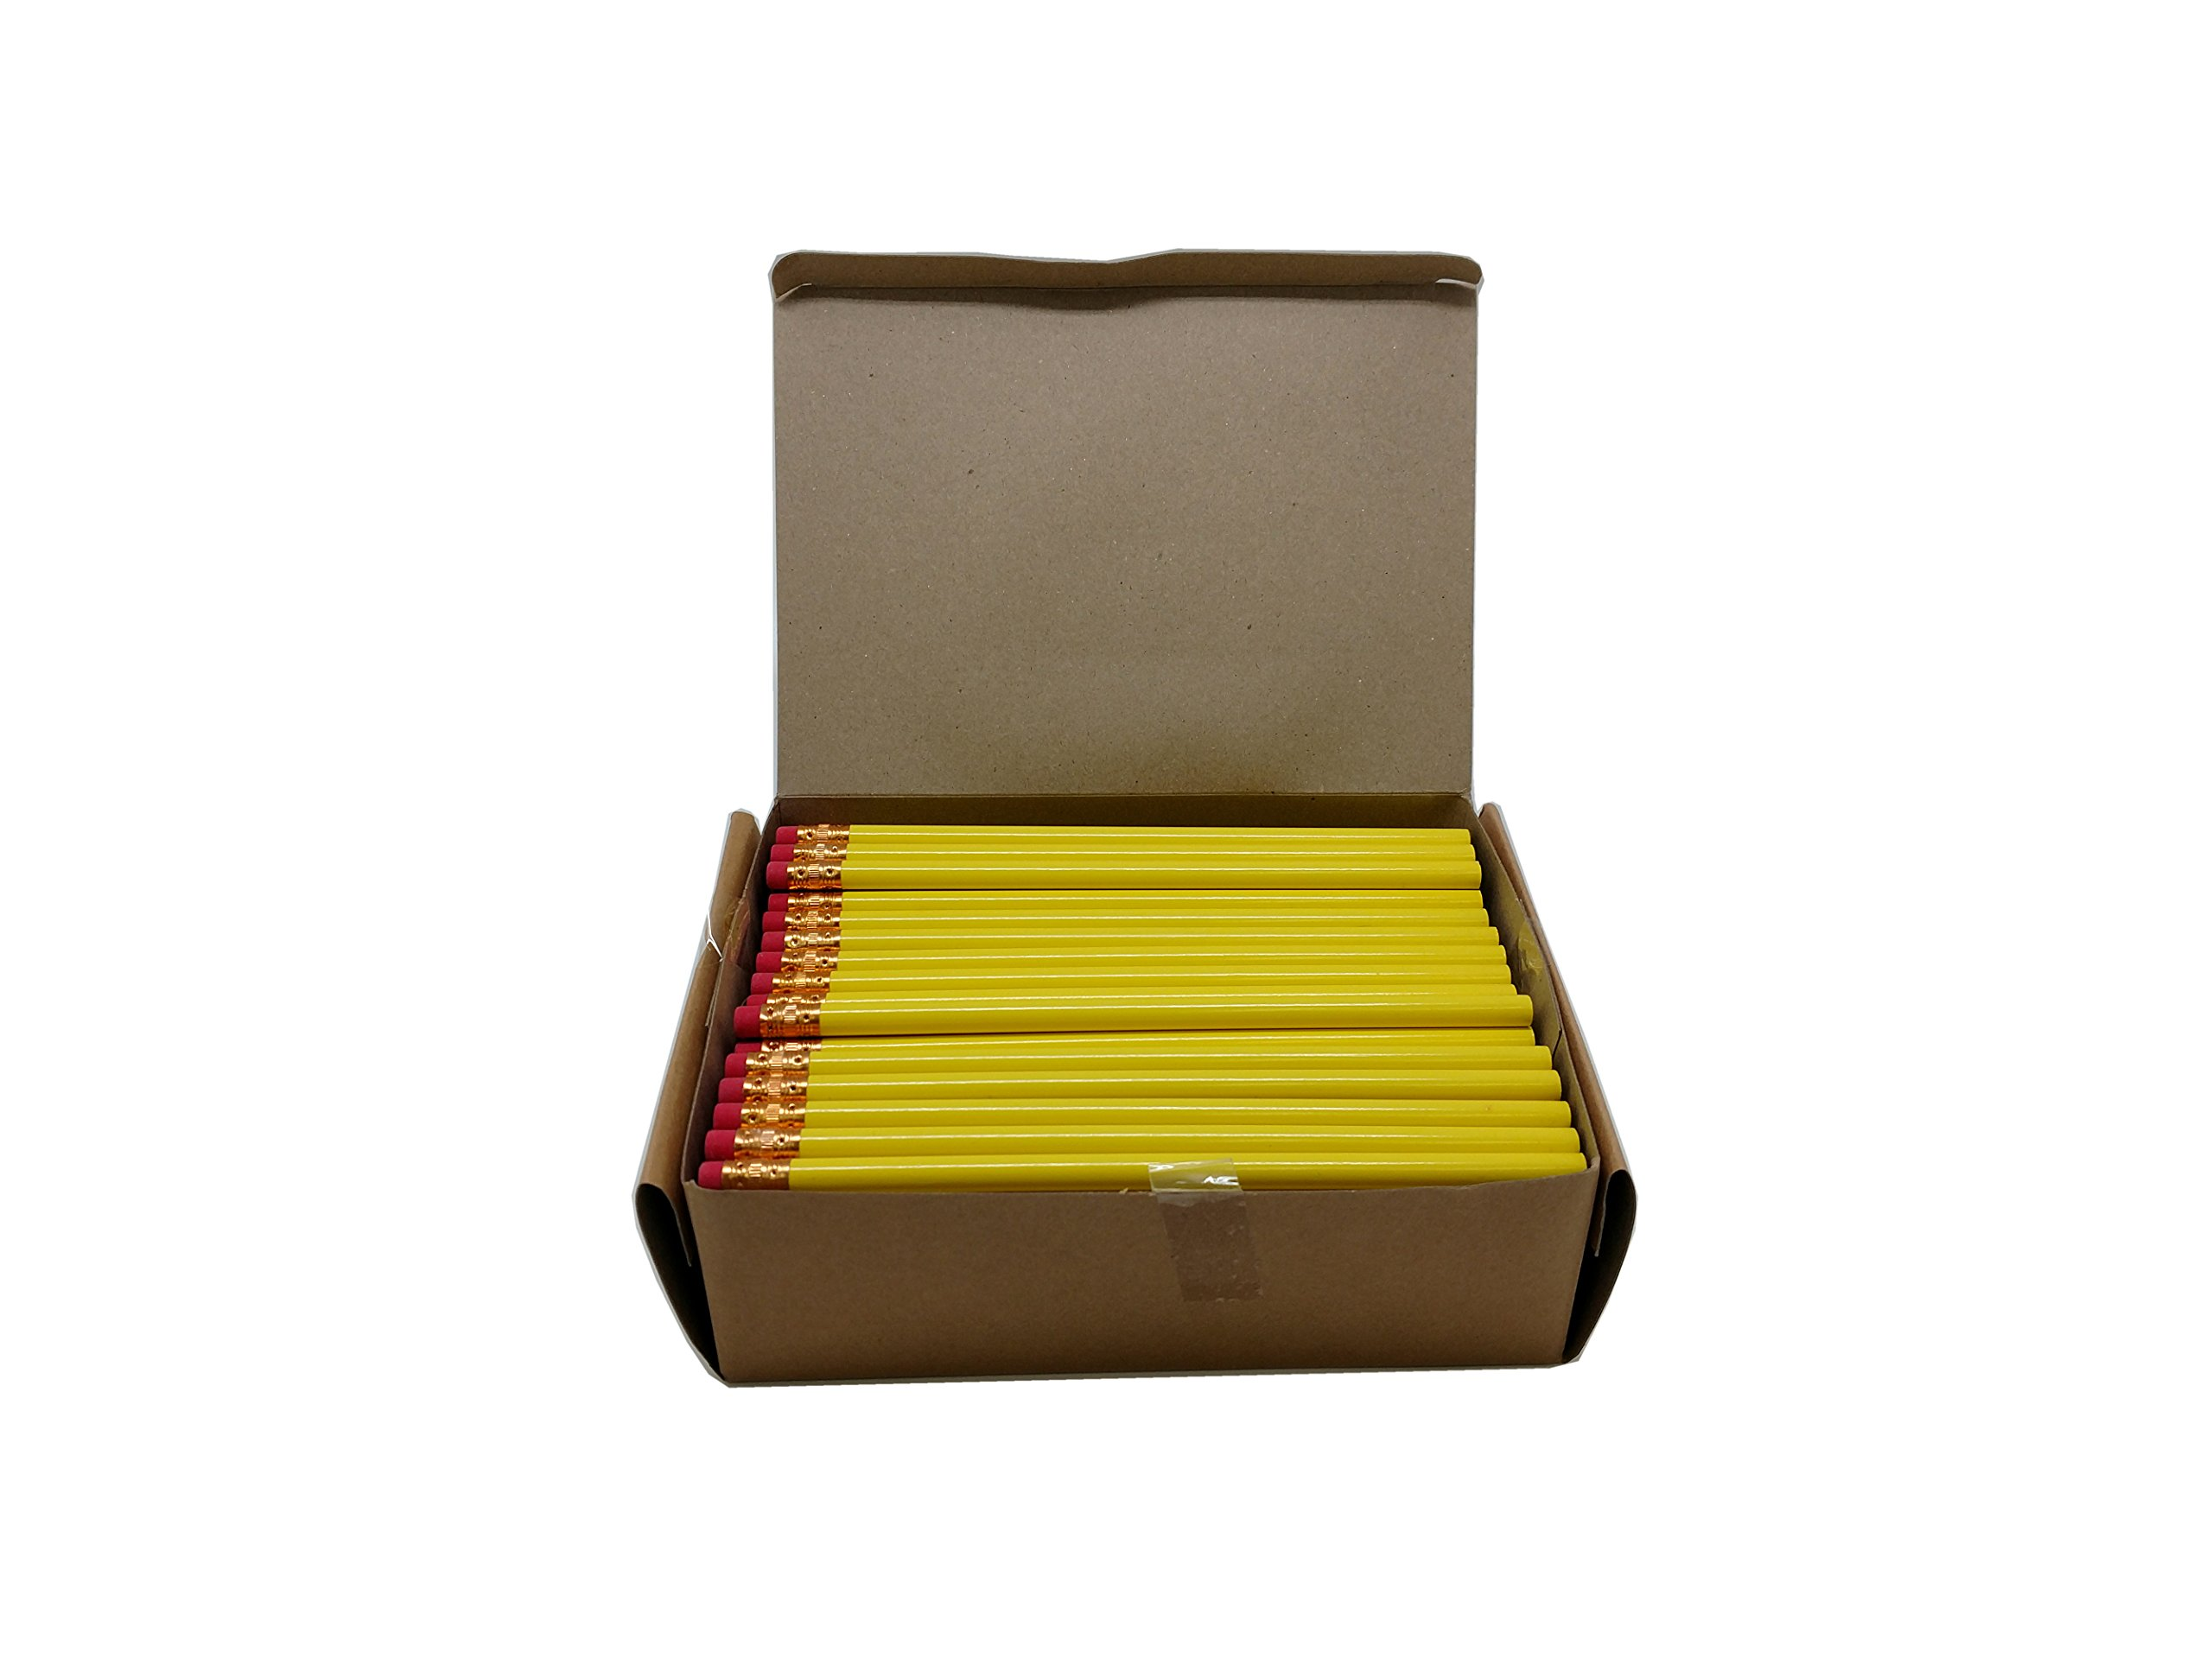 Impex Round Wood #2 HB Pencils (4 Gross, Bulk Lot of 576pcs, Classroom Set) (Bright Yellow)